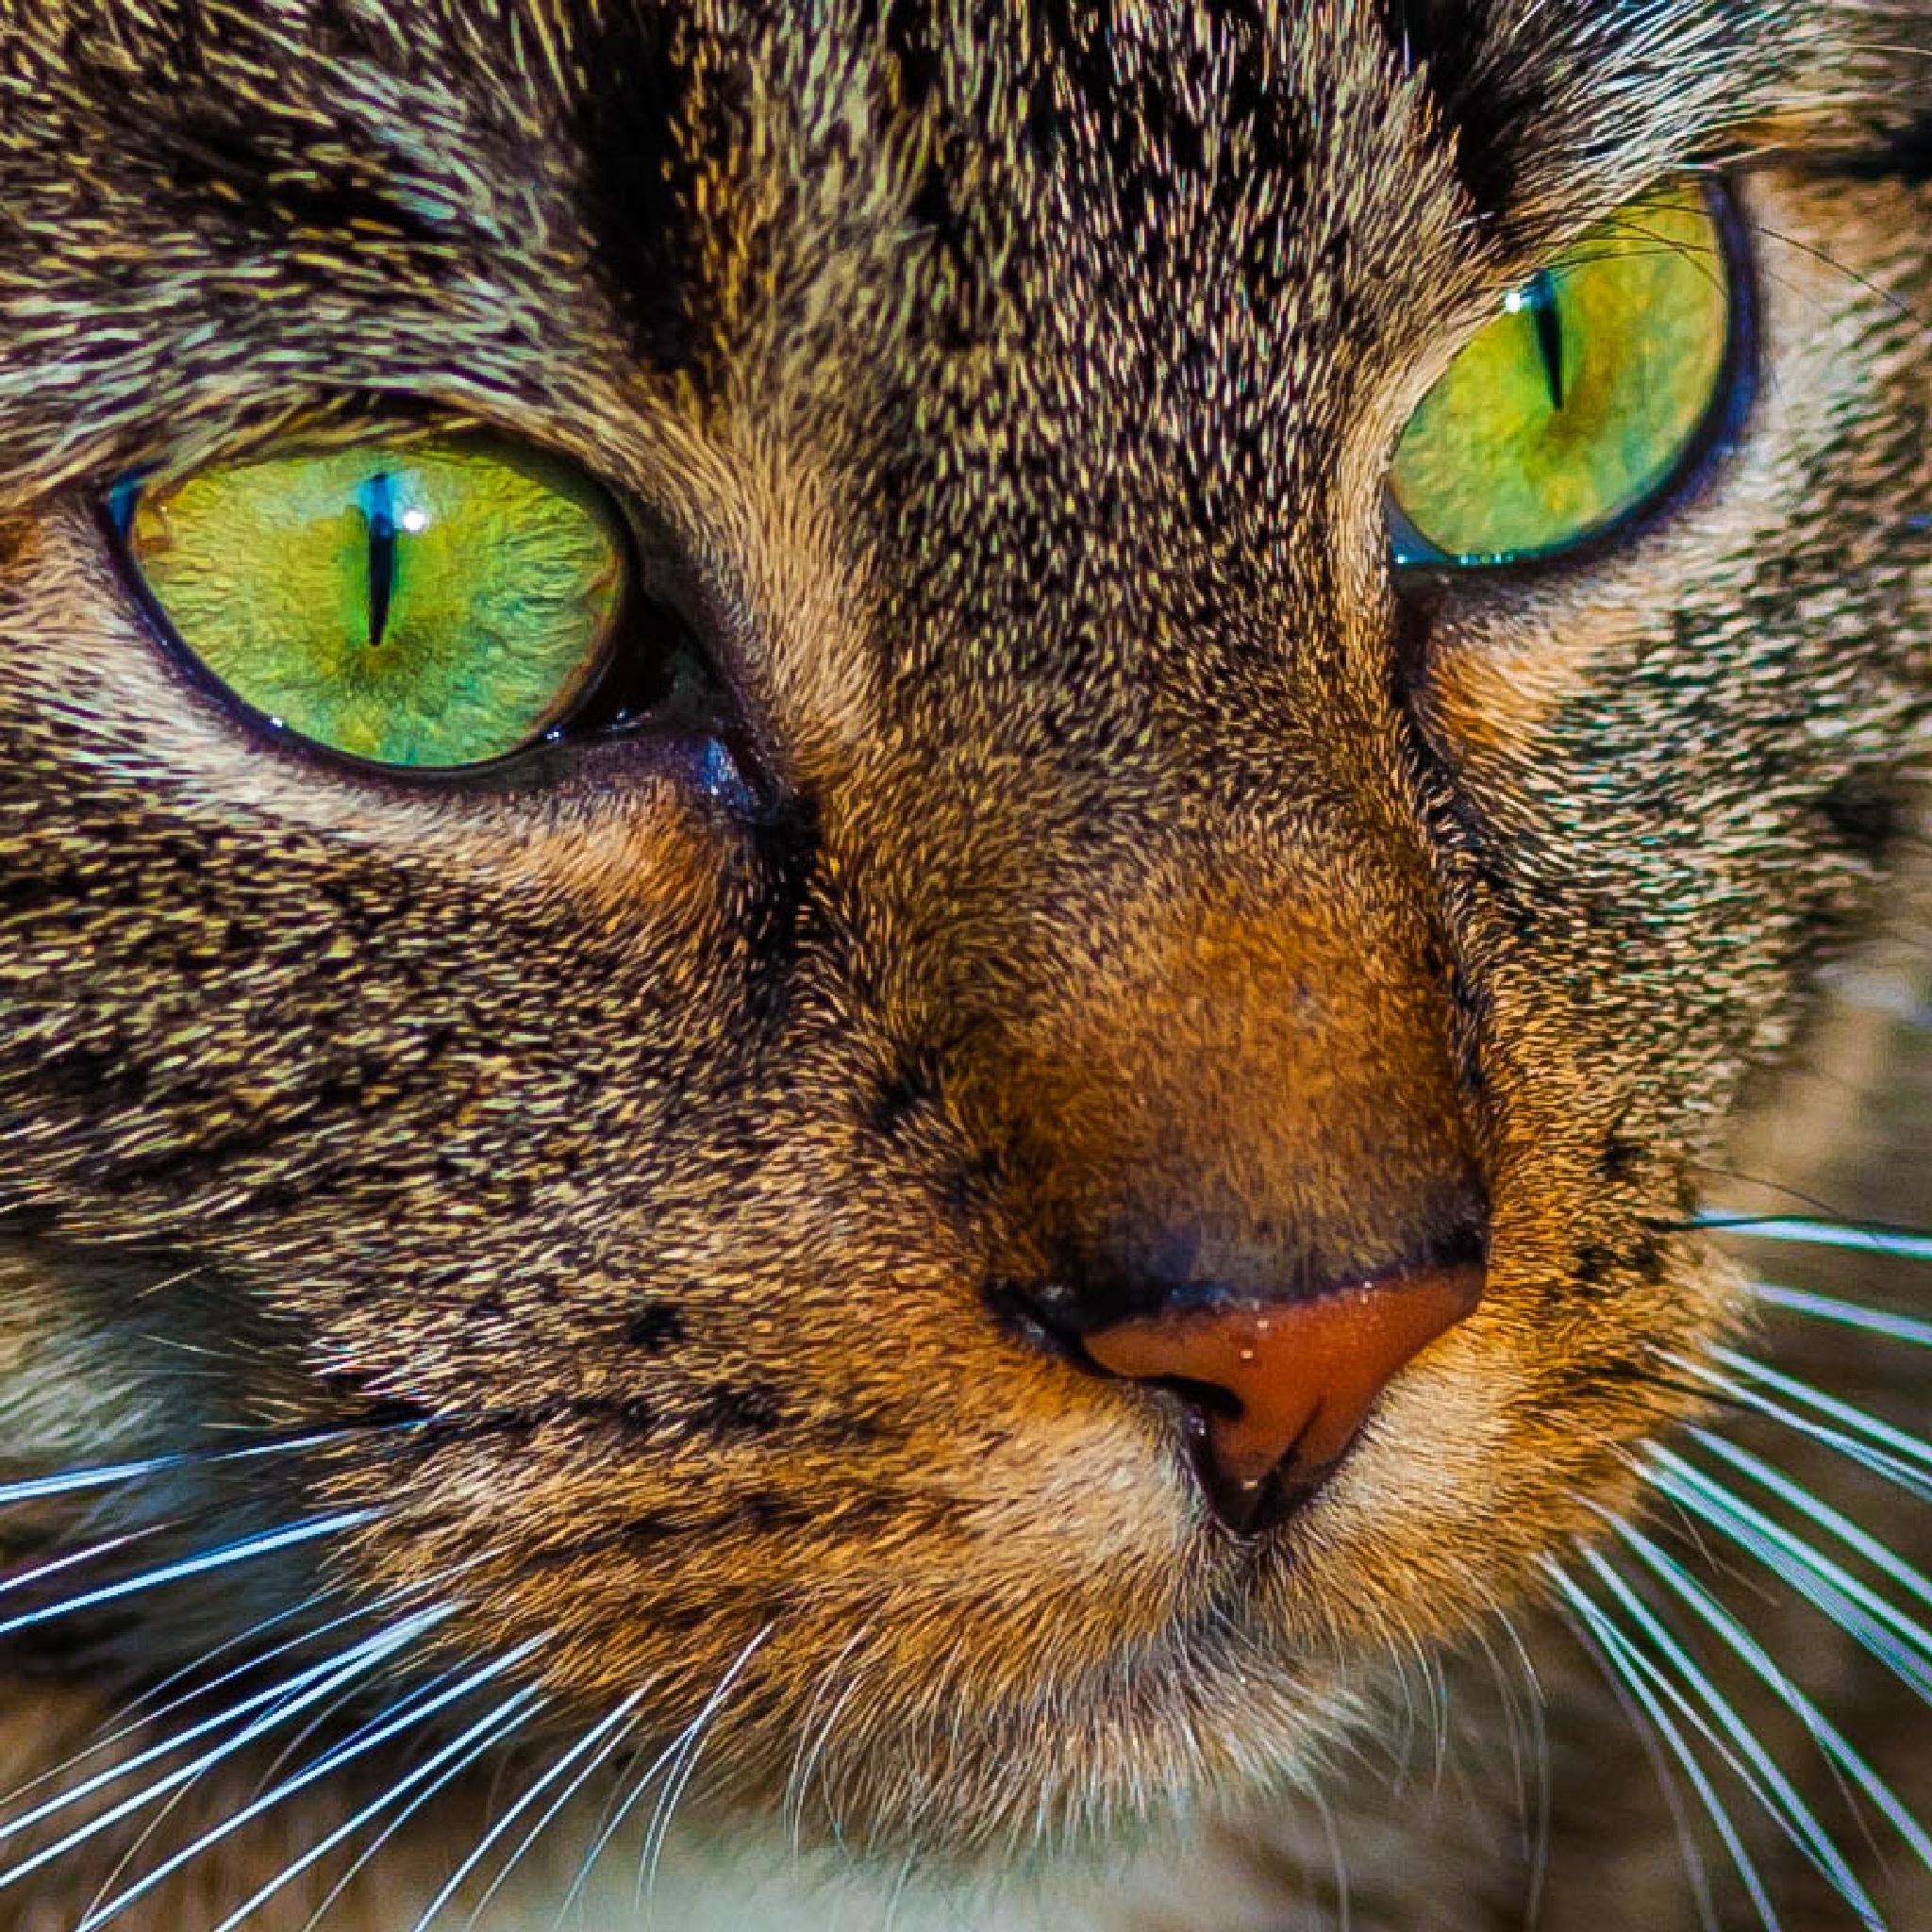 Green Eyes by Stephan Winkler